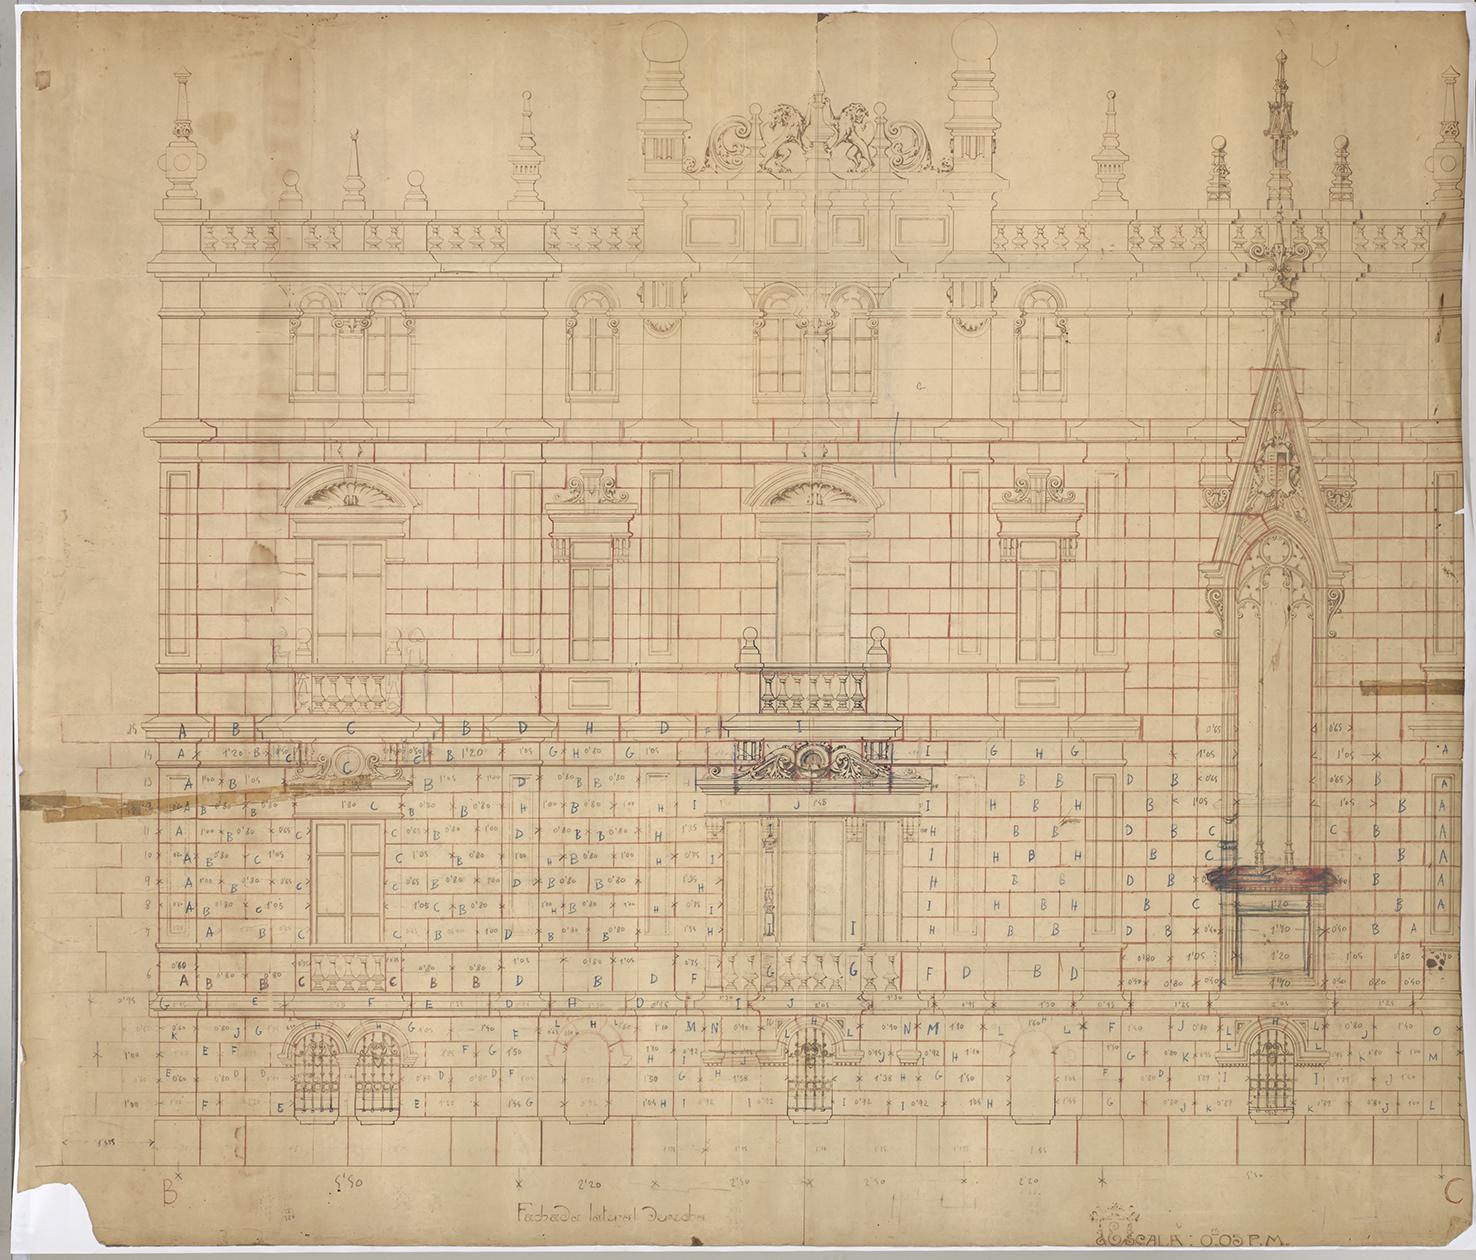 Proyecto del Palacio Augustin Zulueta. Fachada lateral derecha